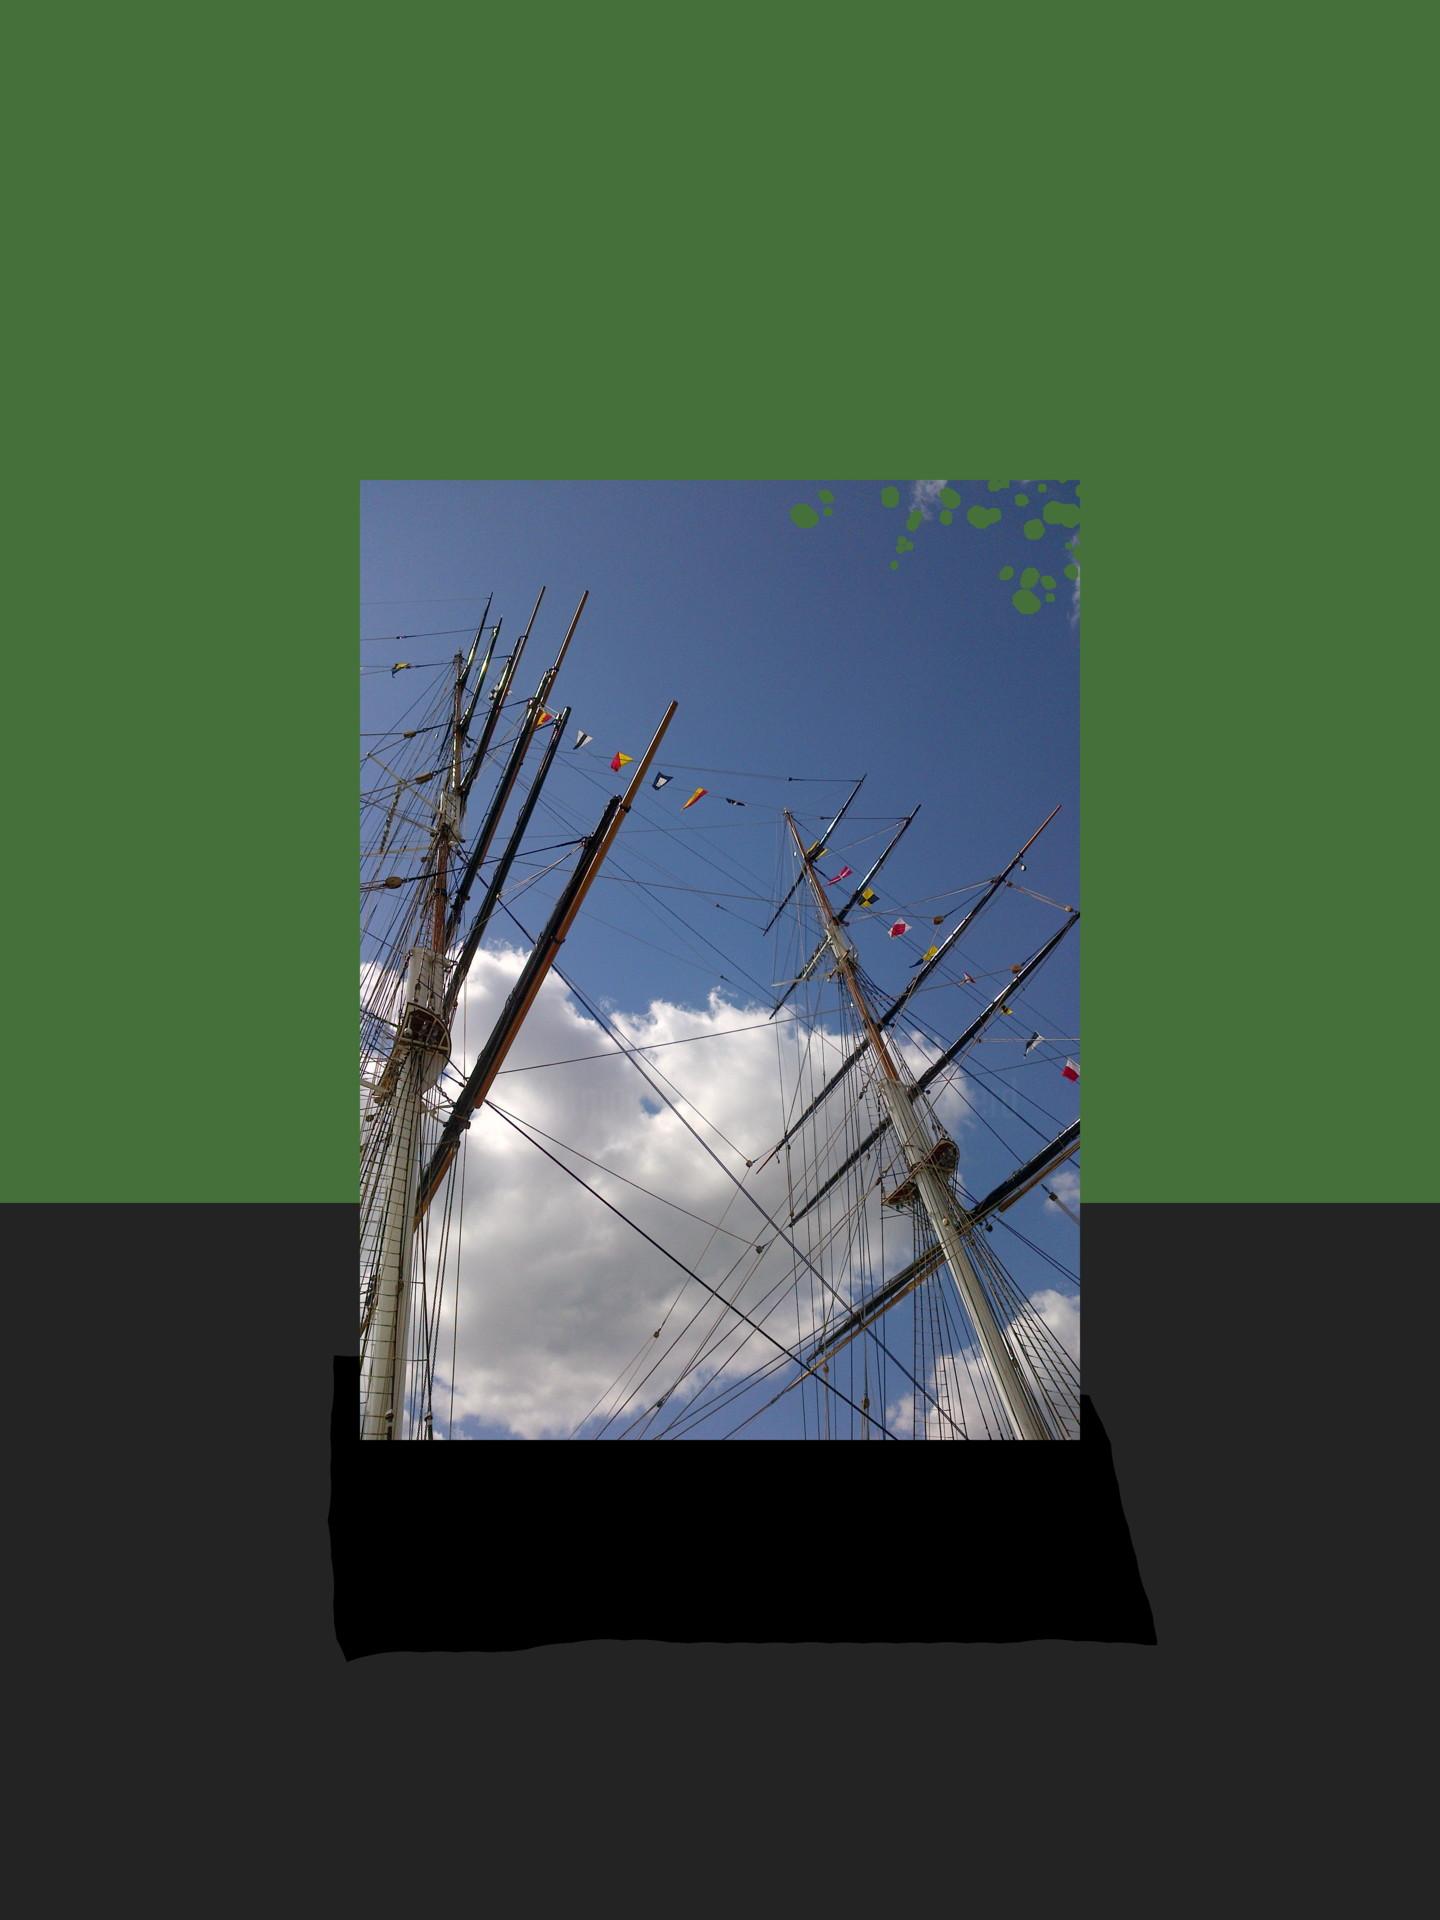 Gerald Shepherd - Captive Masts